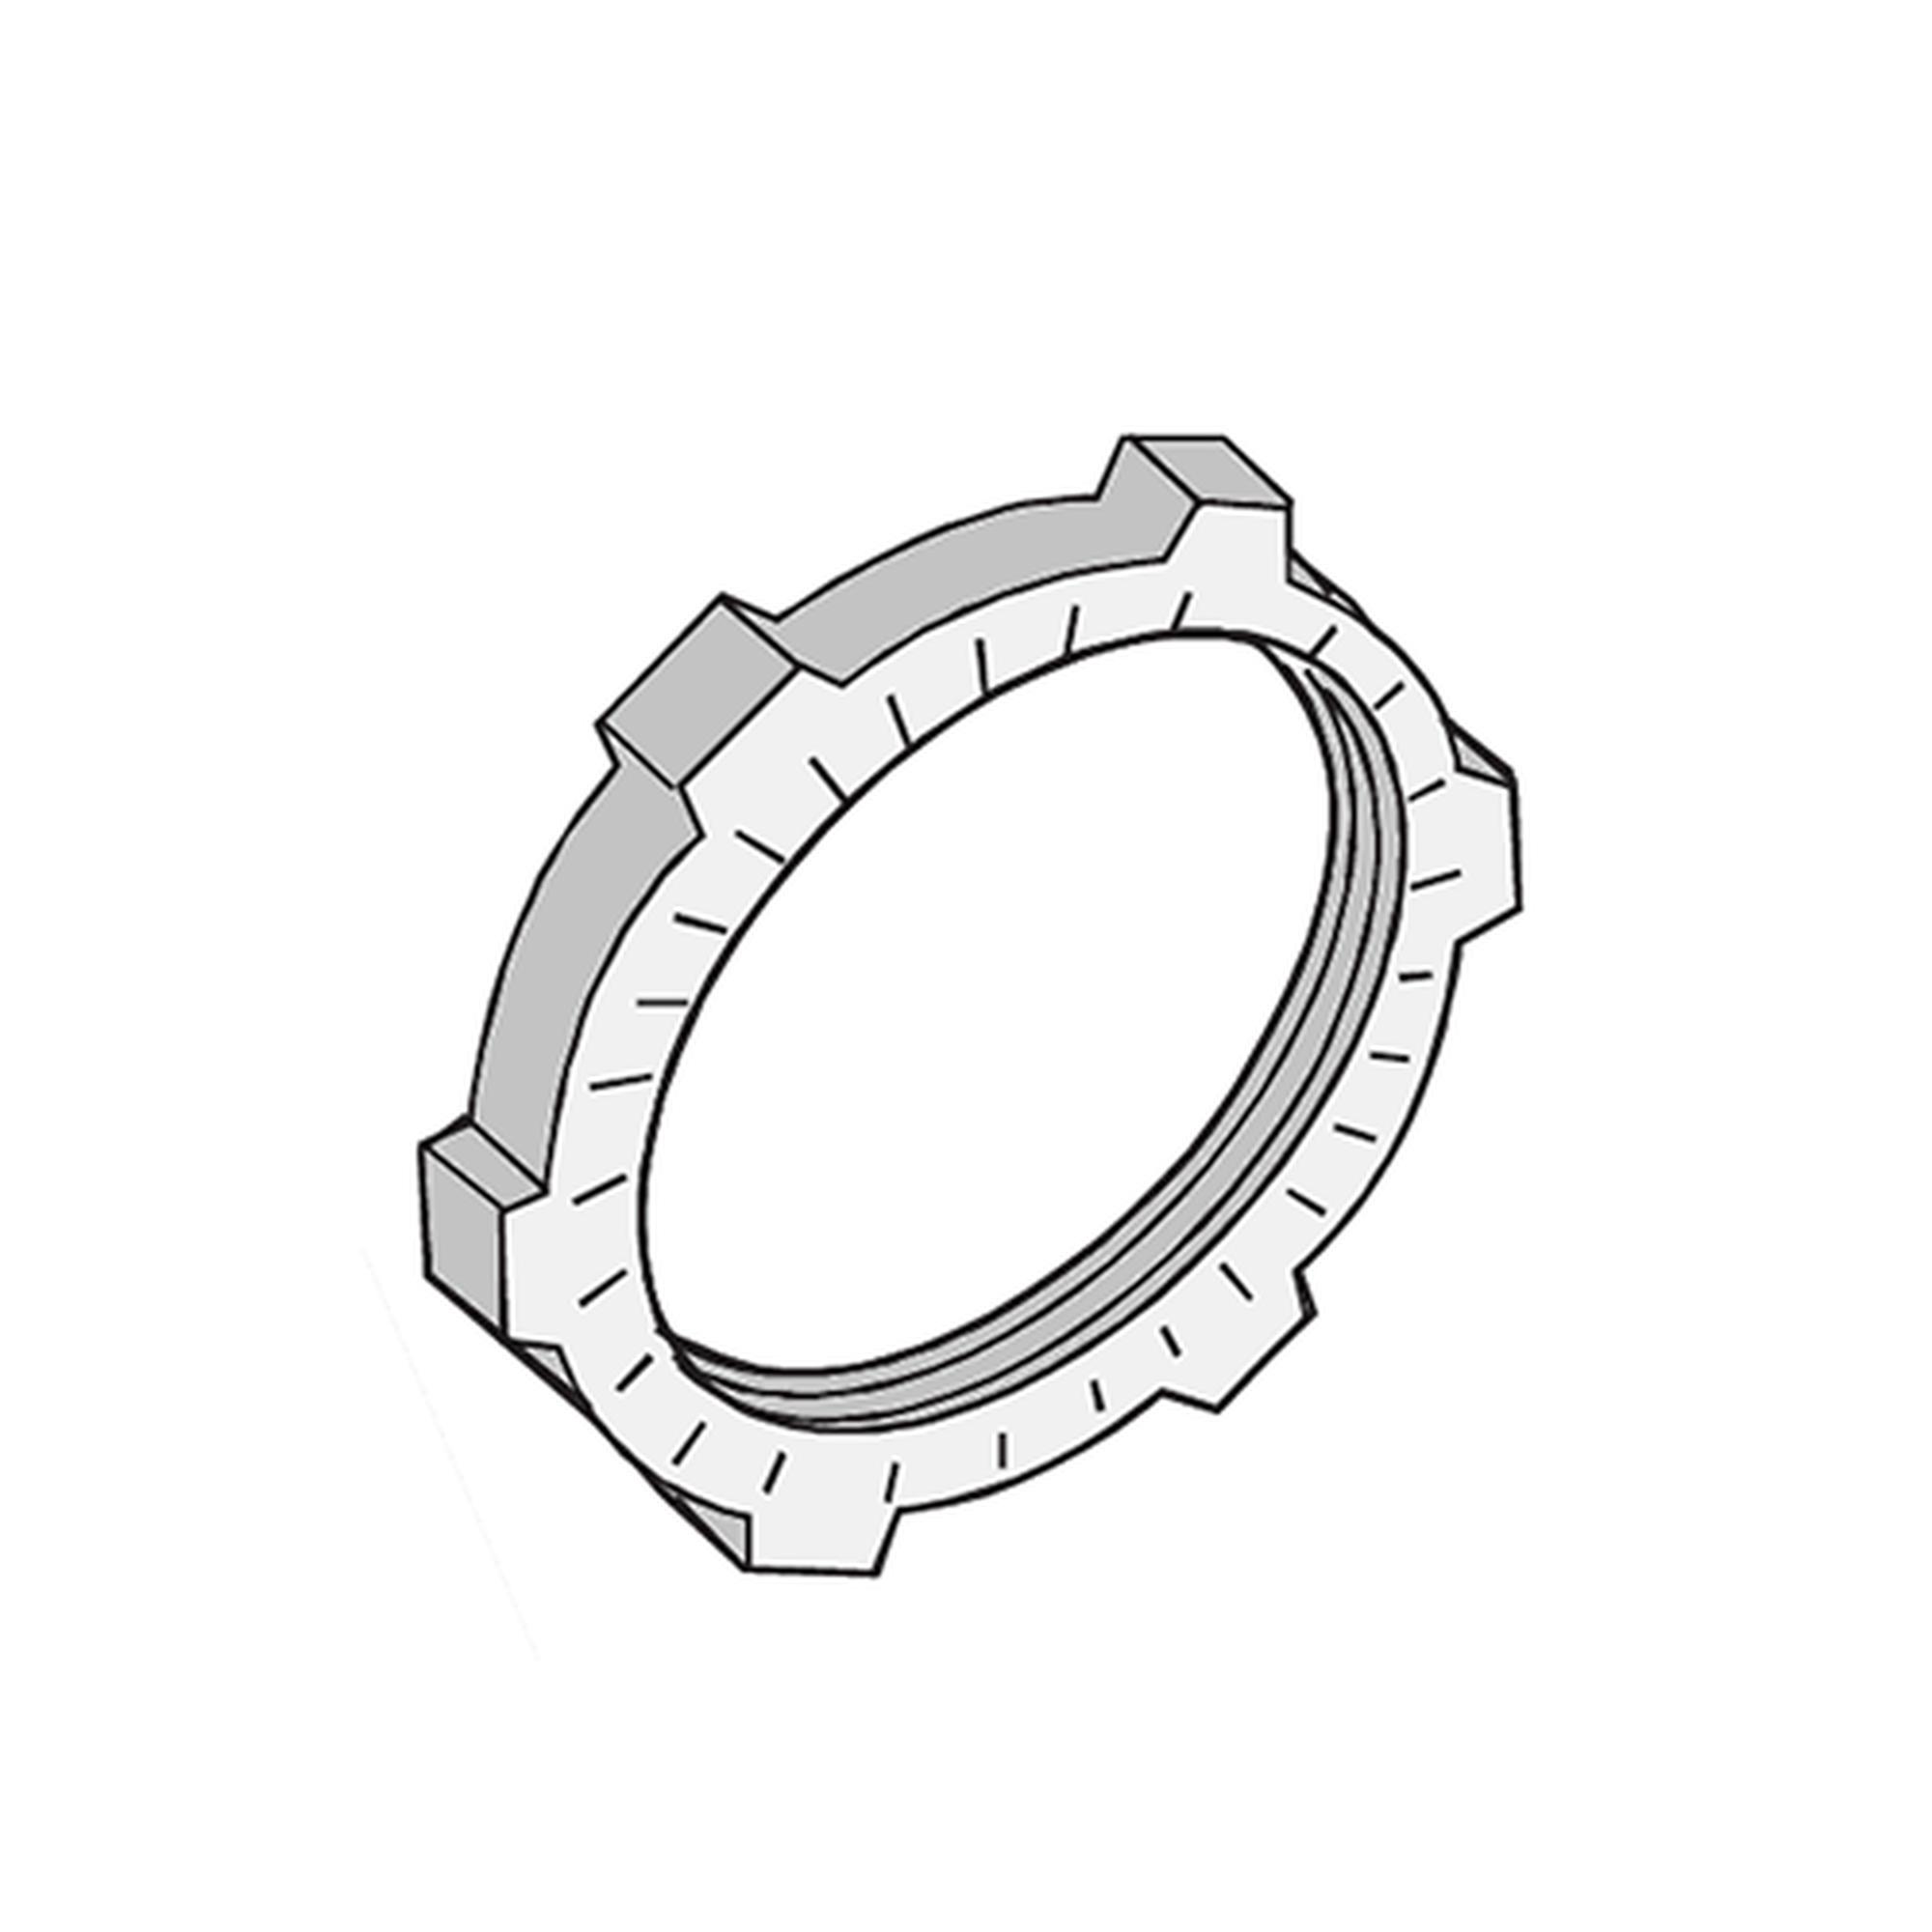 Contratuerca Metálica Zamac de 3/4 (19 mm)